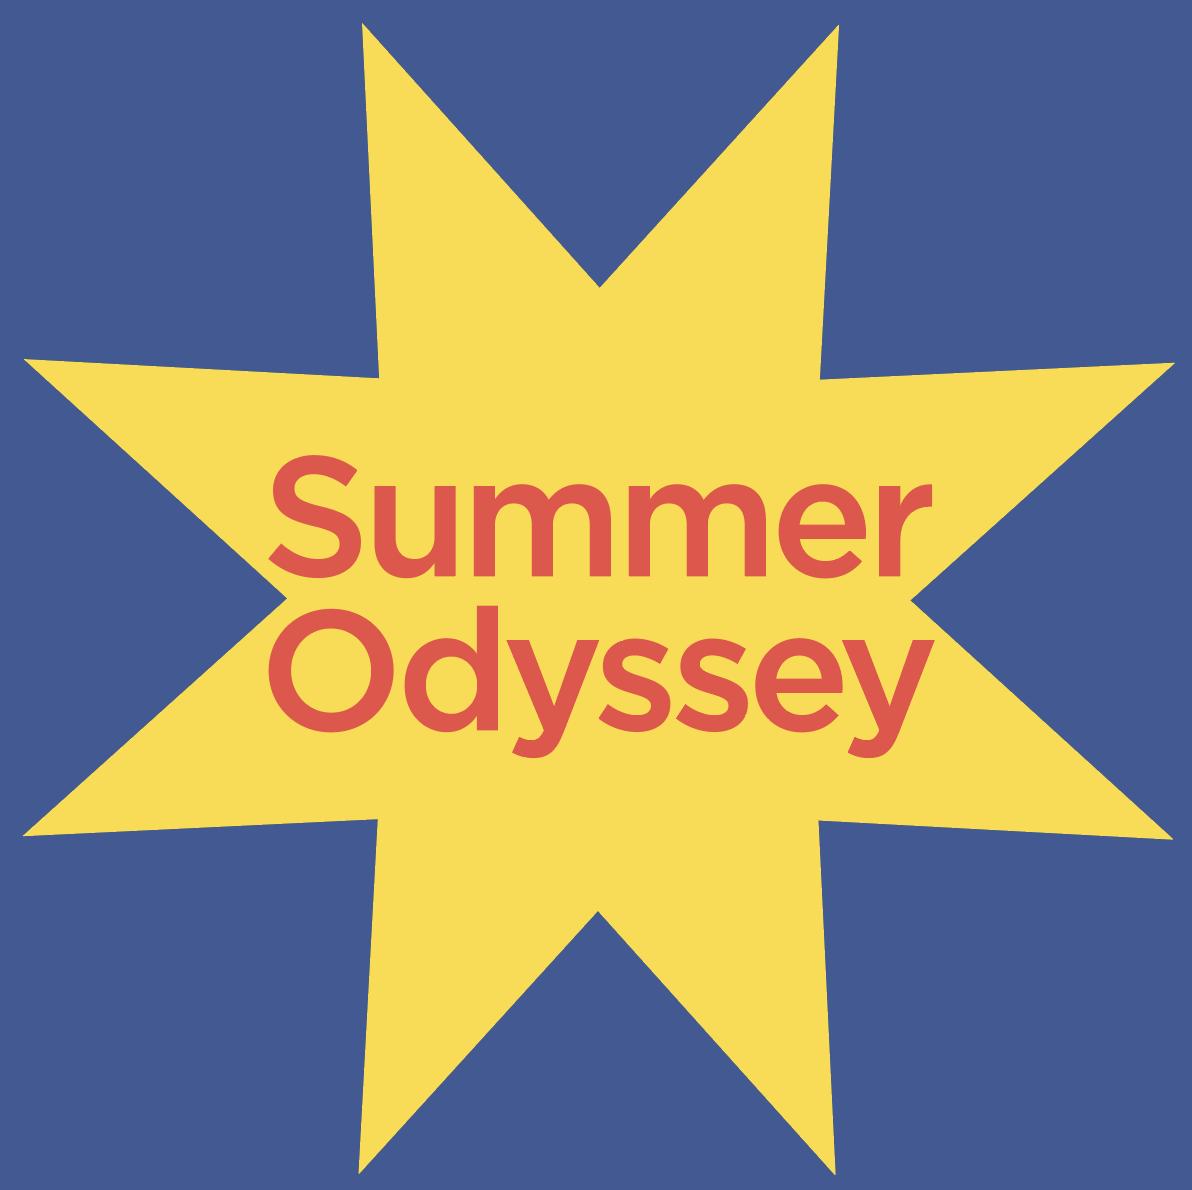 Summer Odyssey